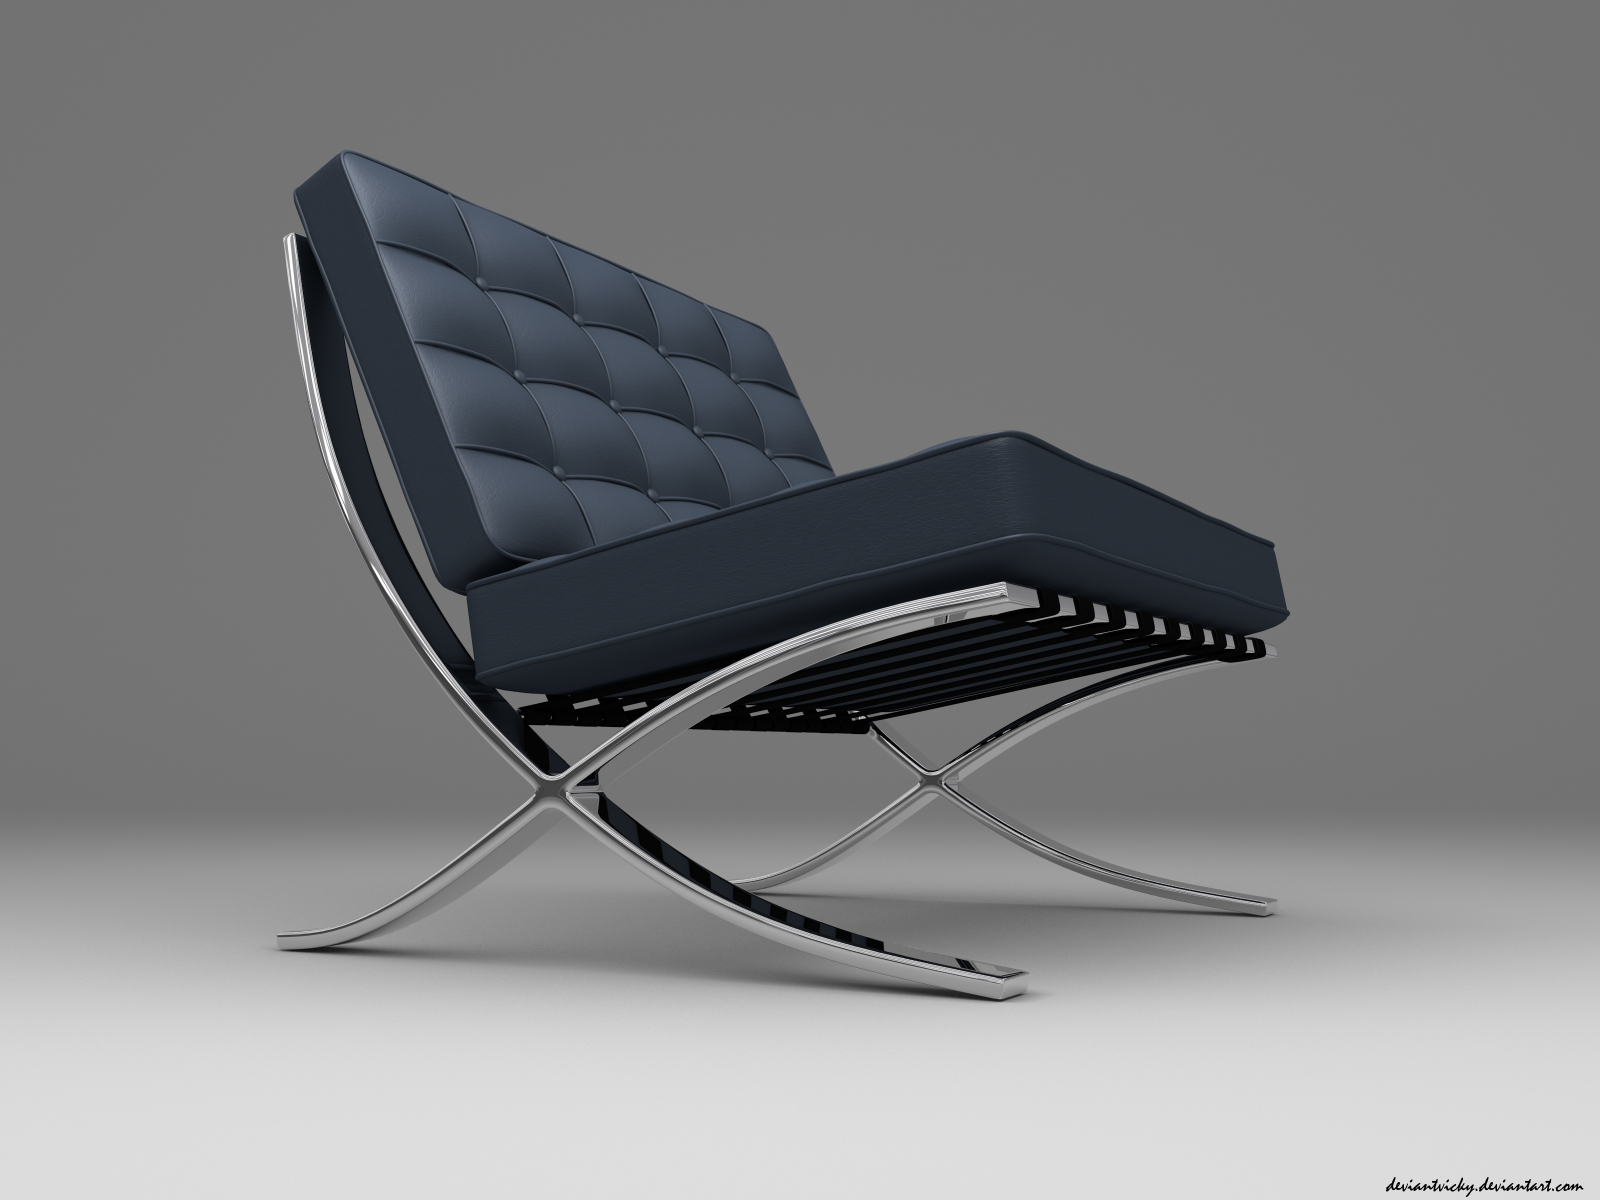 Barcelona Chair 1 By VickyM72 Barcelona Chair 1 By VickyM72